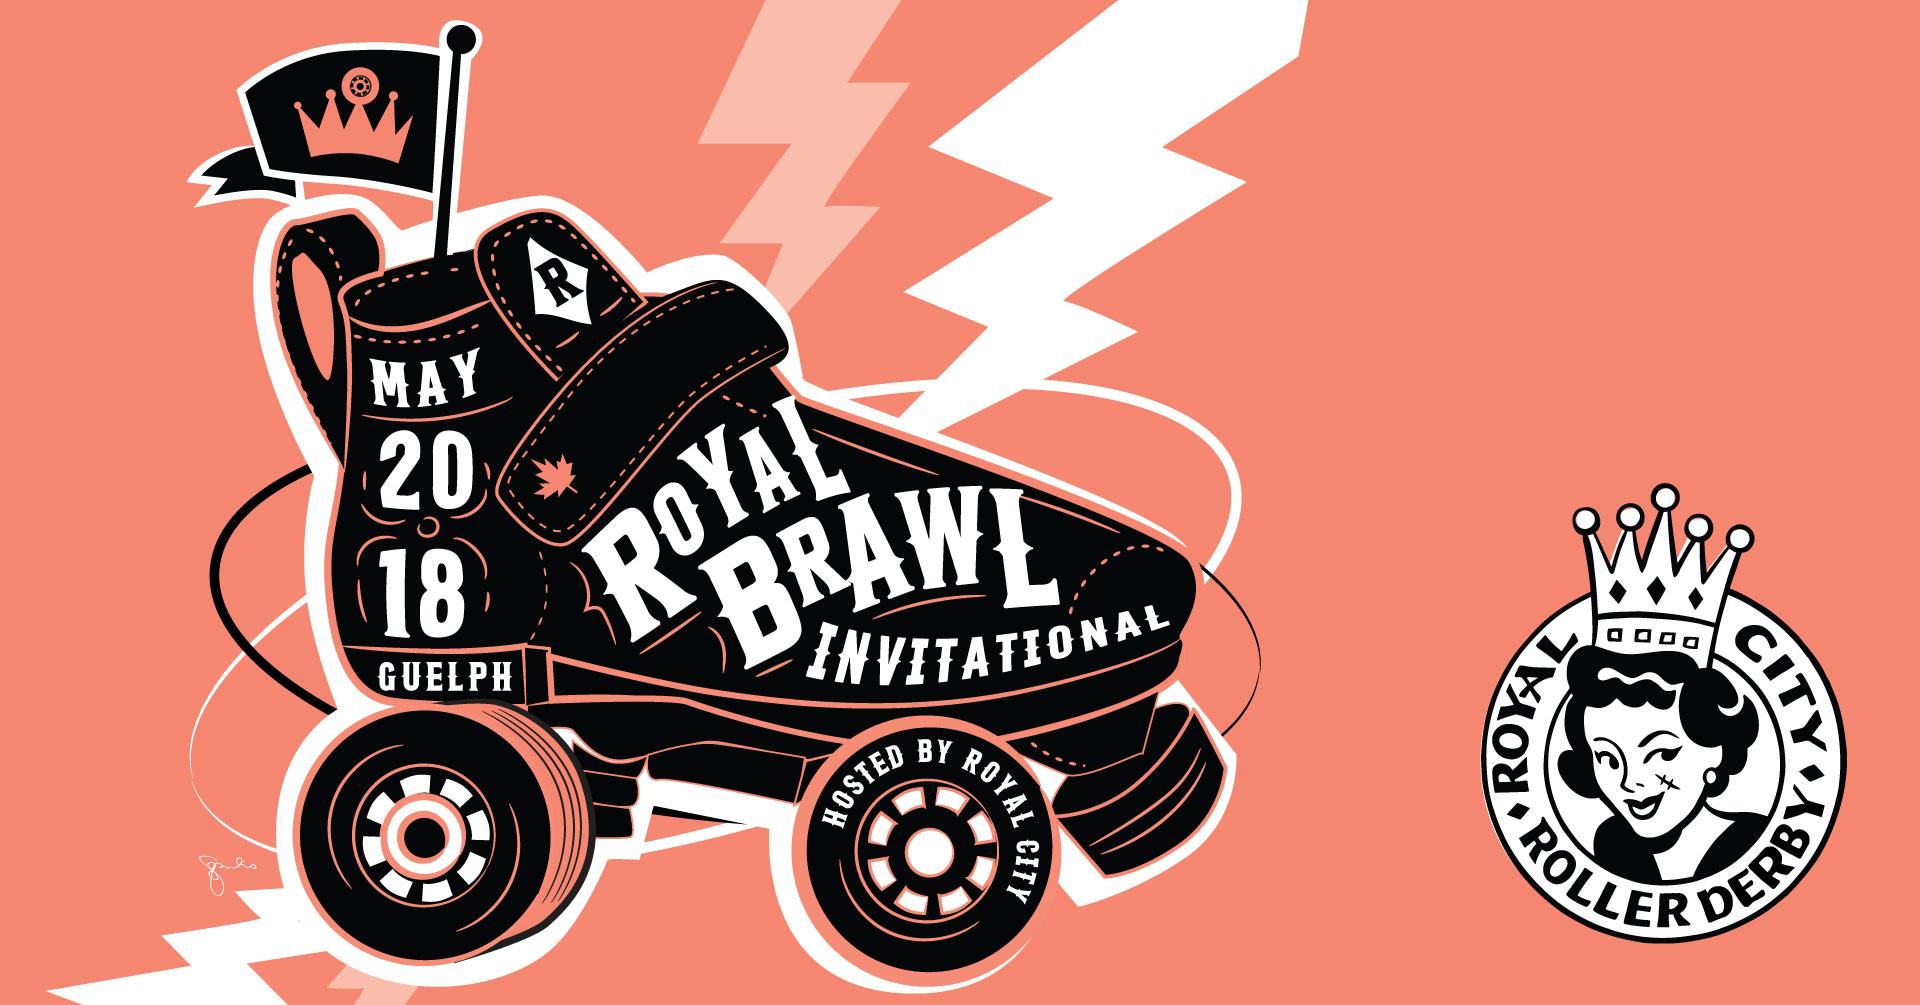 Royal Brawl roller skate logo beside RCRD logo. Graphics credit Cai Sepulis.